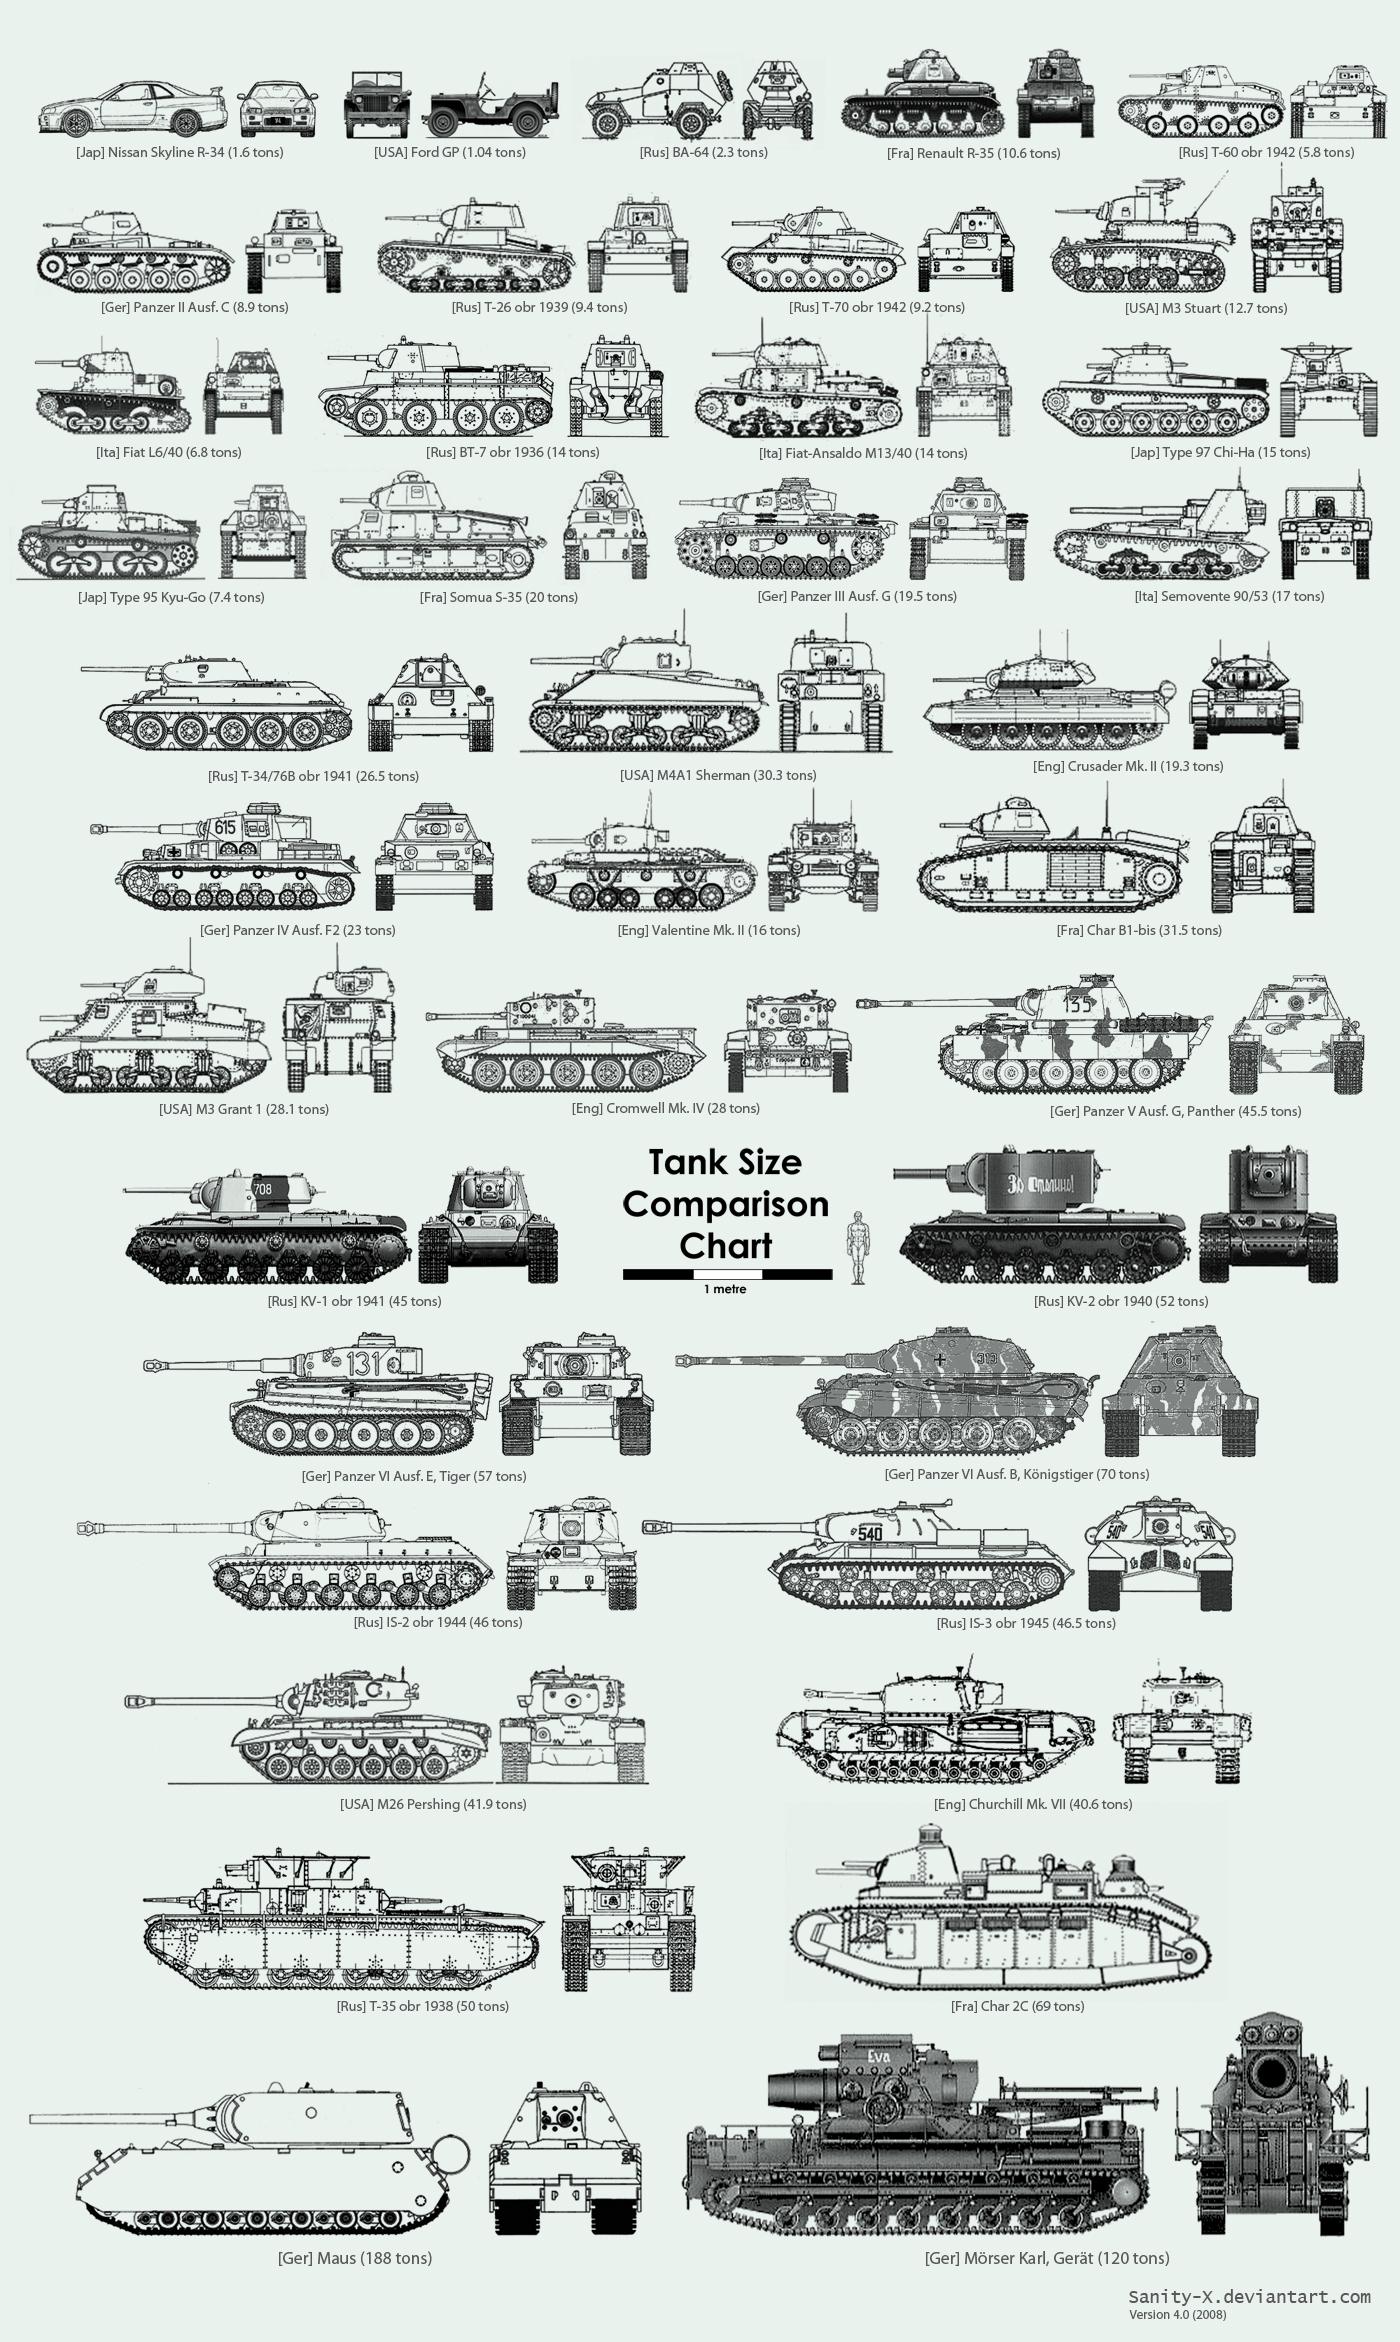 Tank Size Comparison Chart | MilitaryImages Net